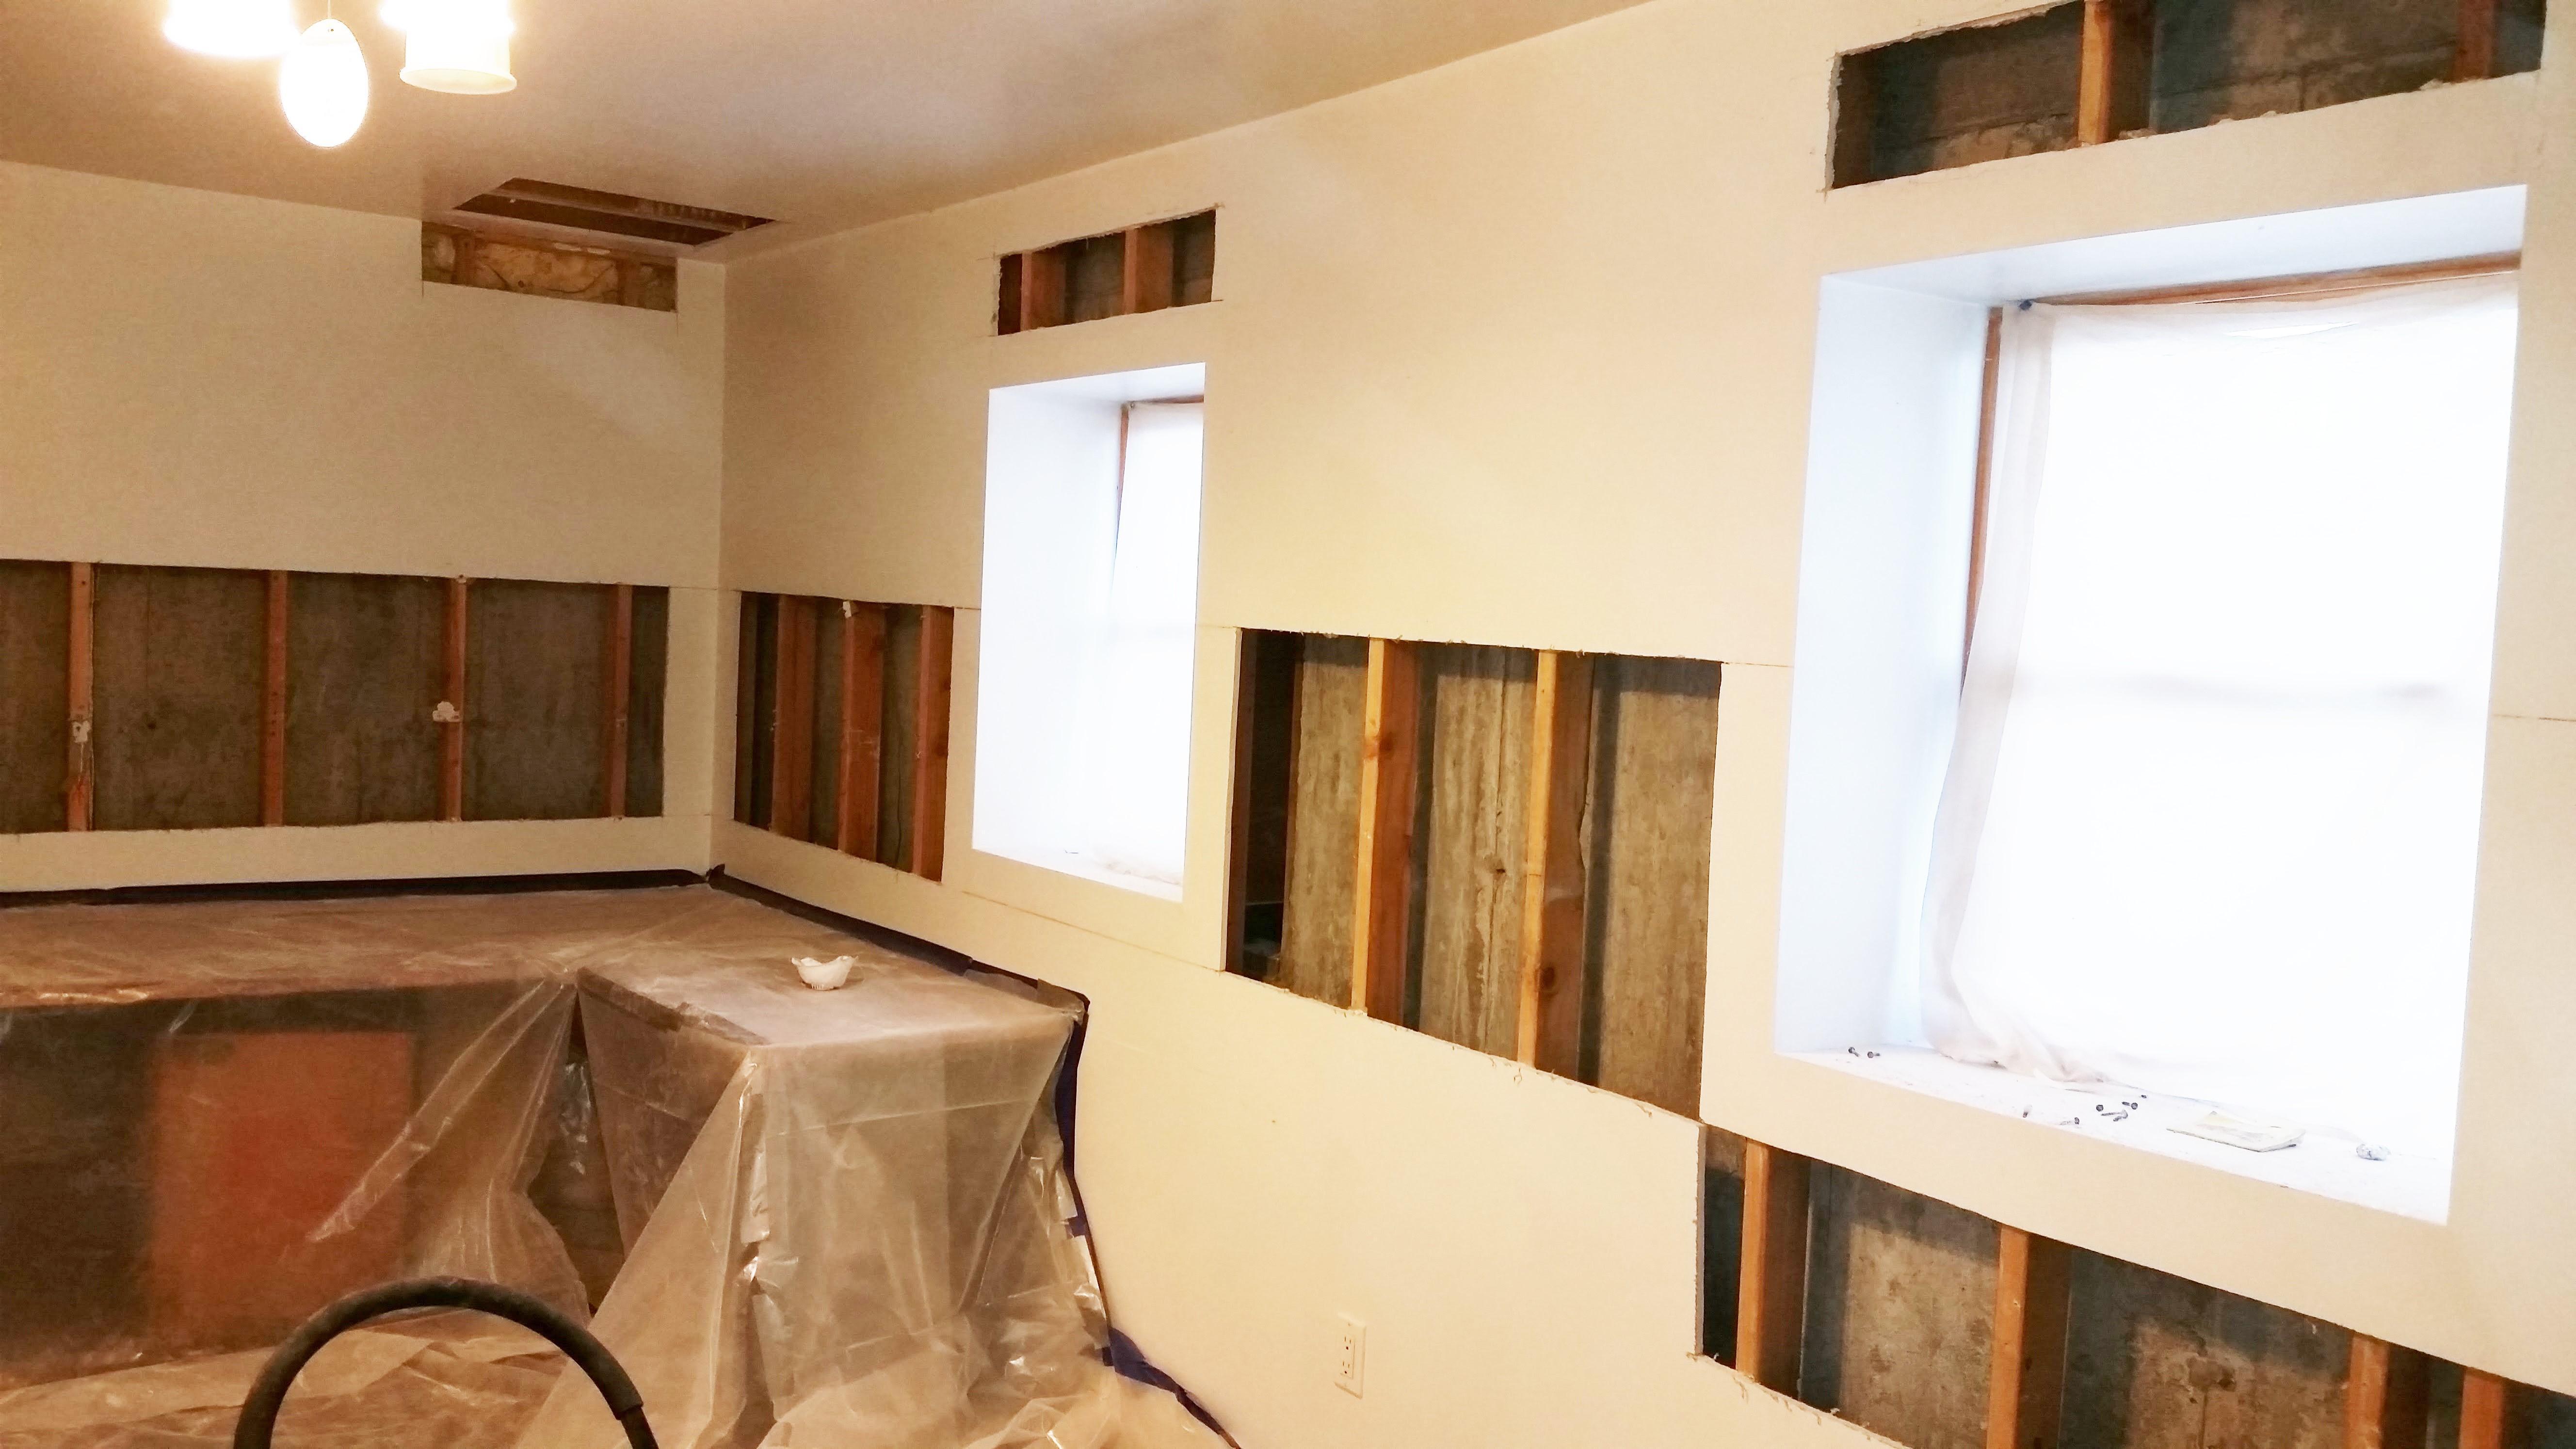 Retrofit Basement Exterior Walls Spray Foam Insulation